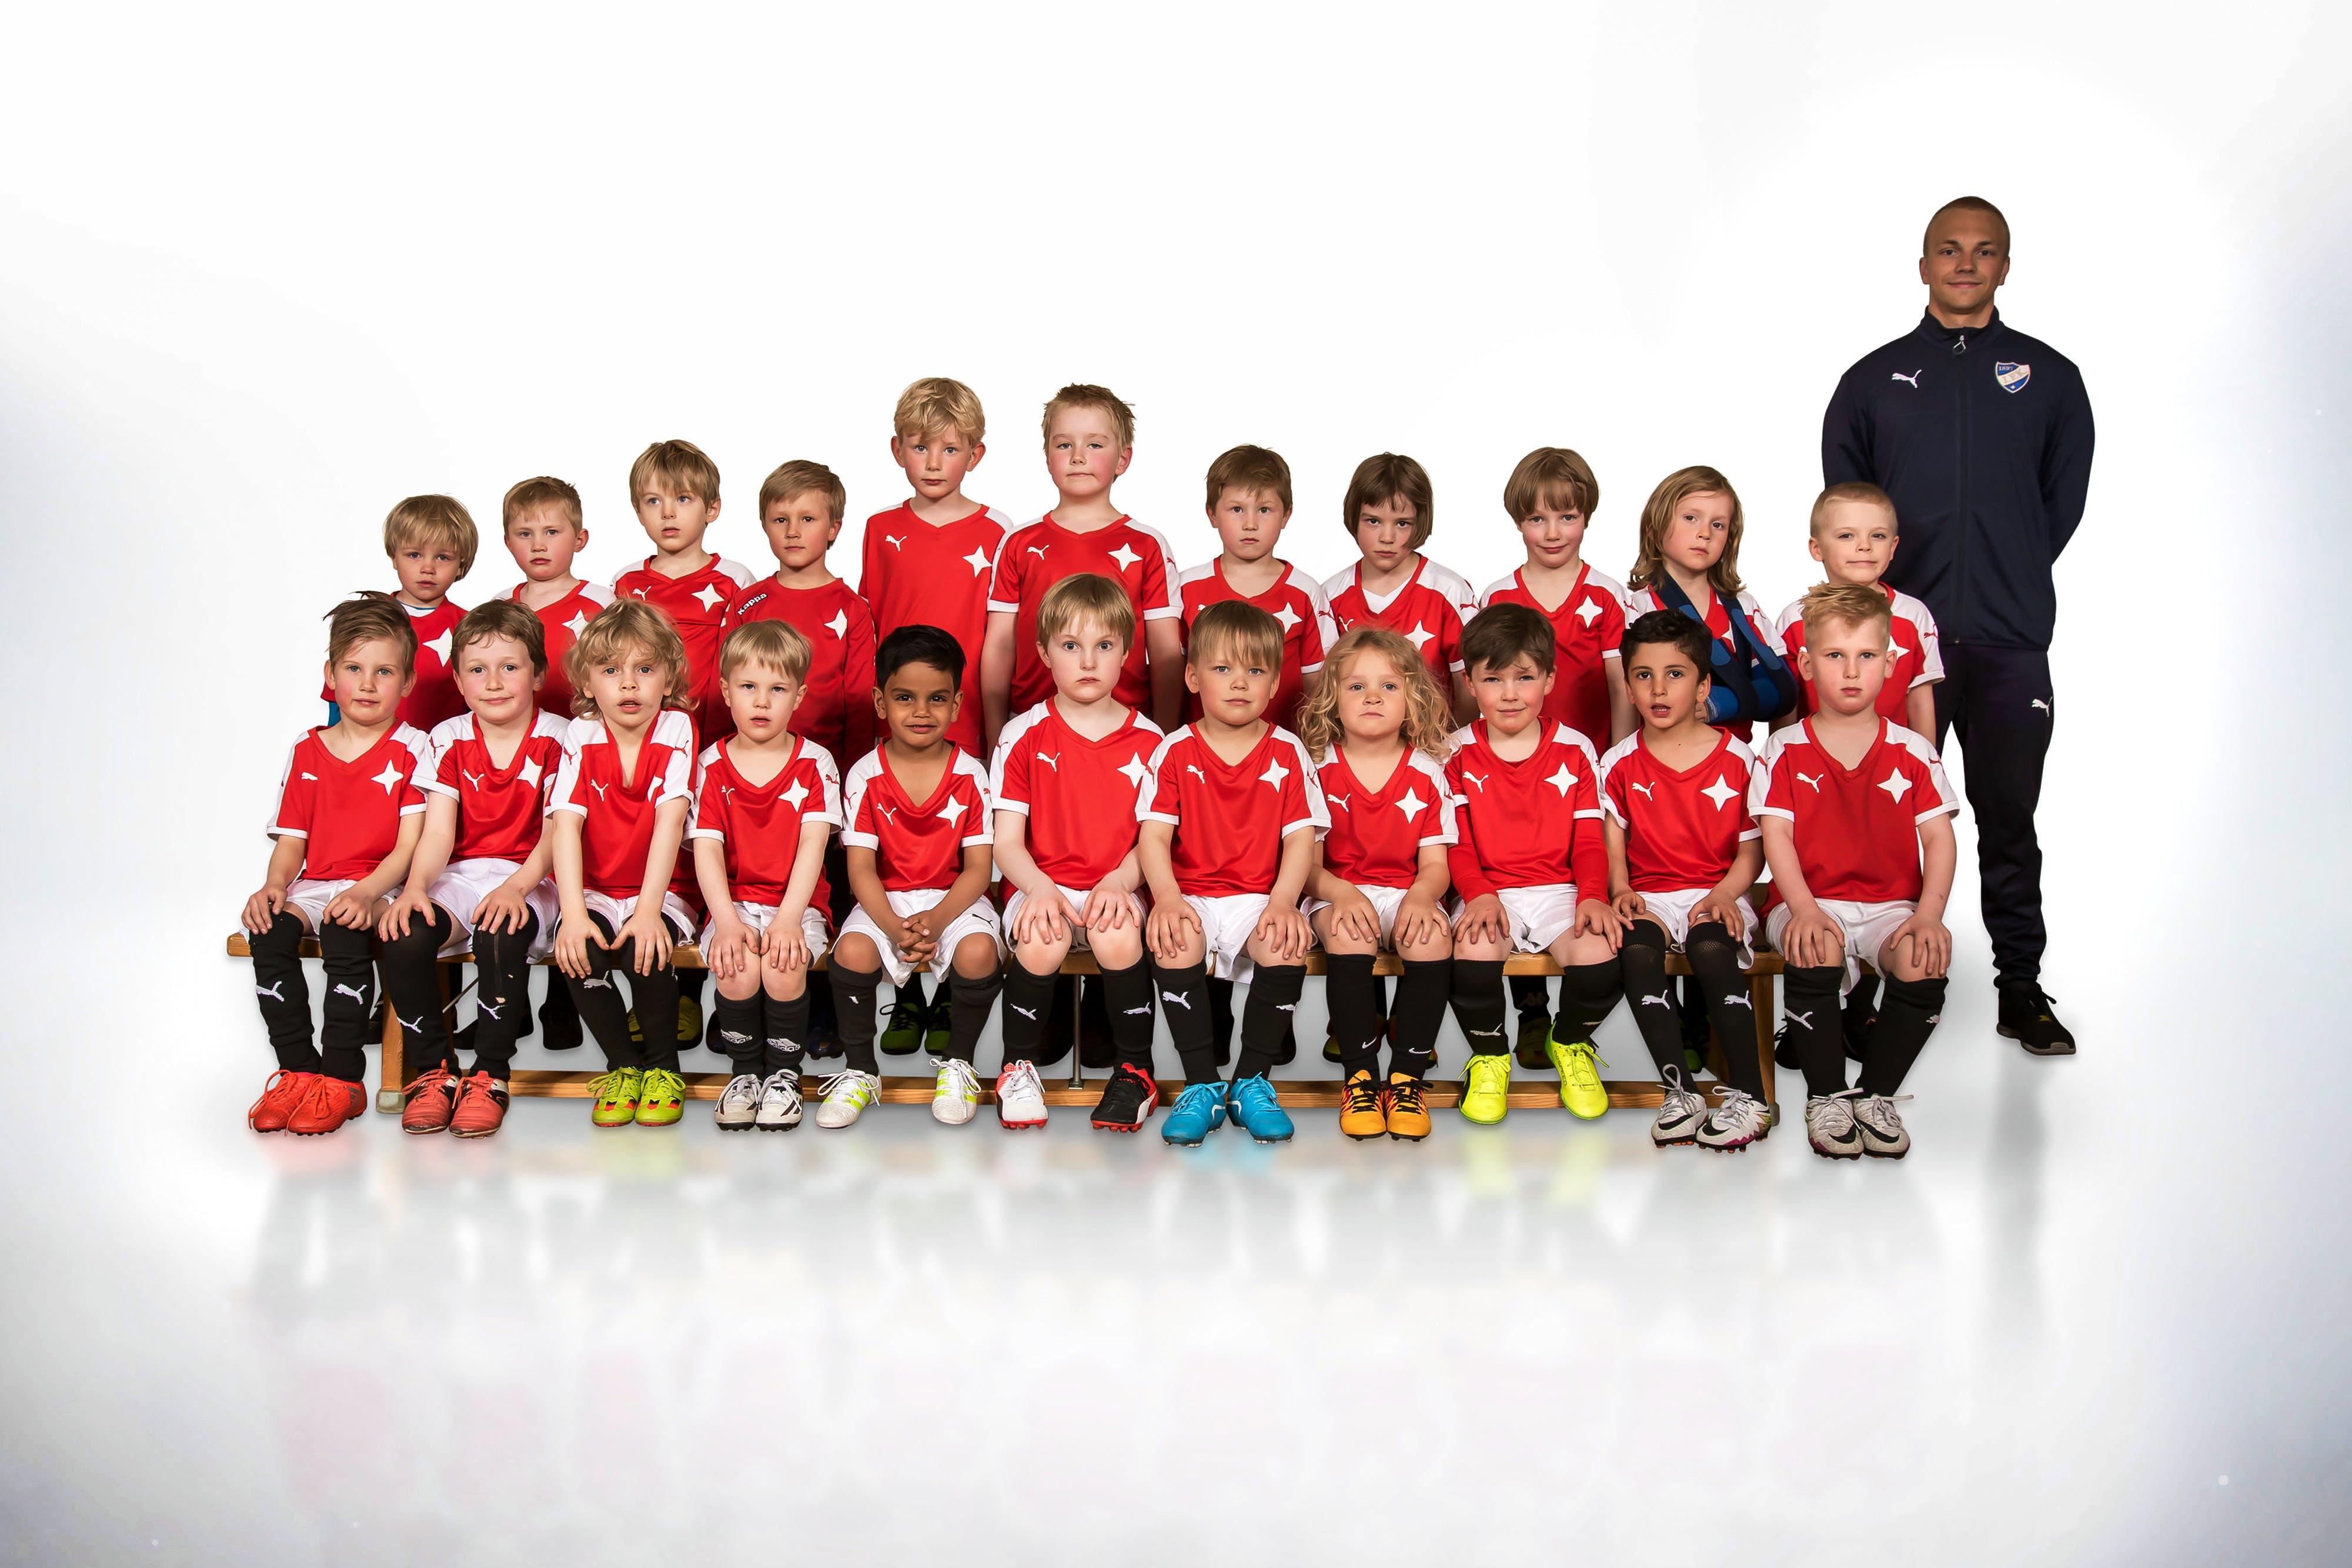 HIFK 2011